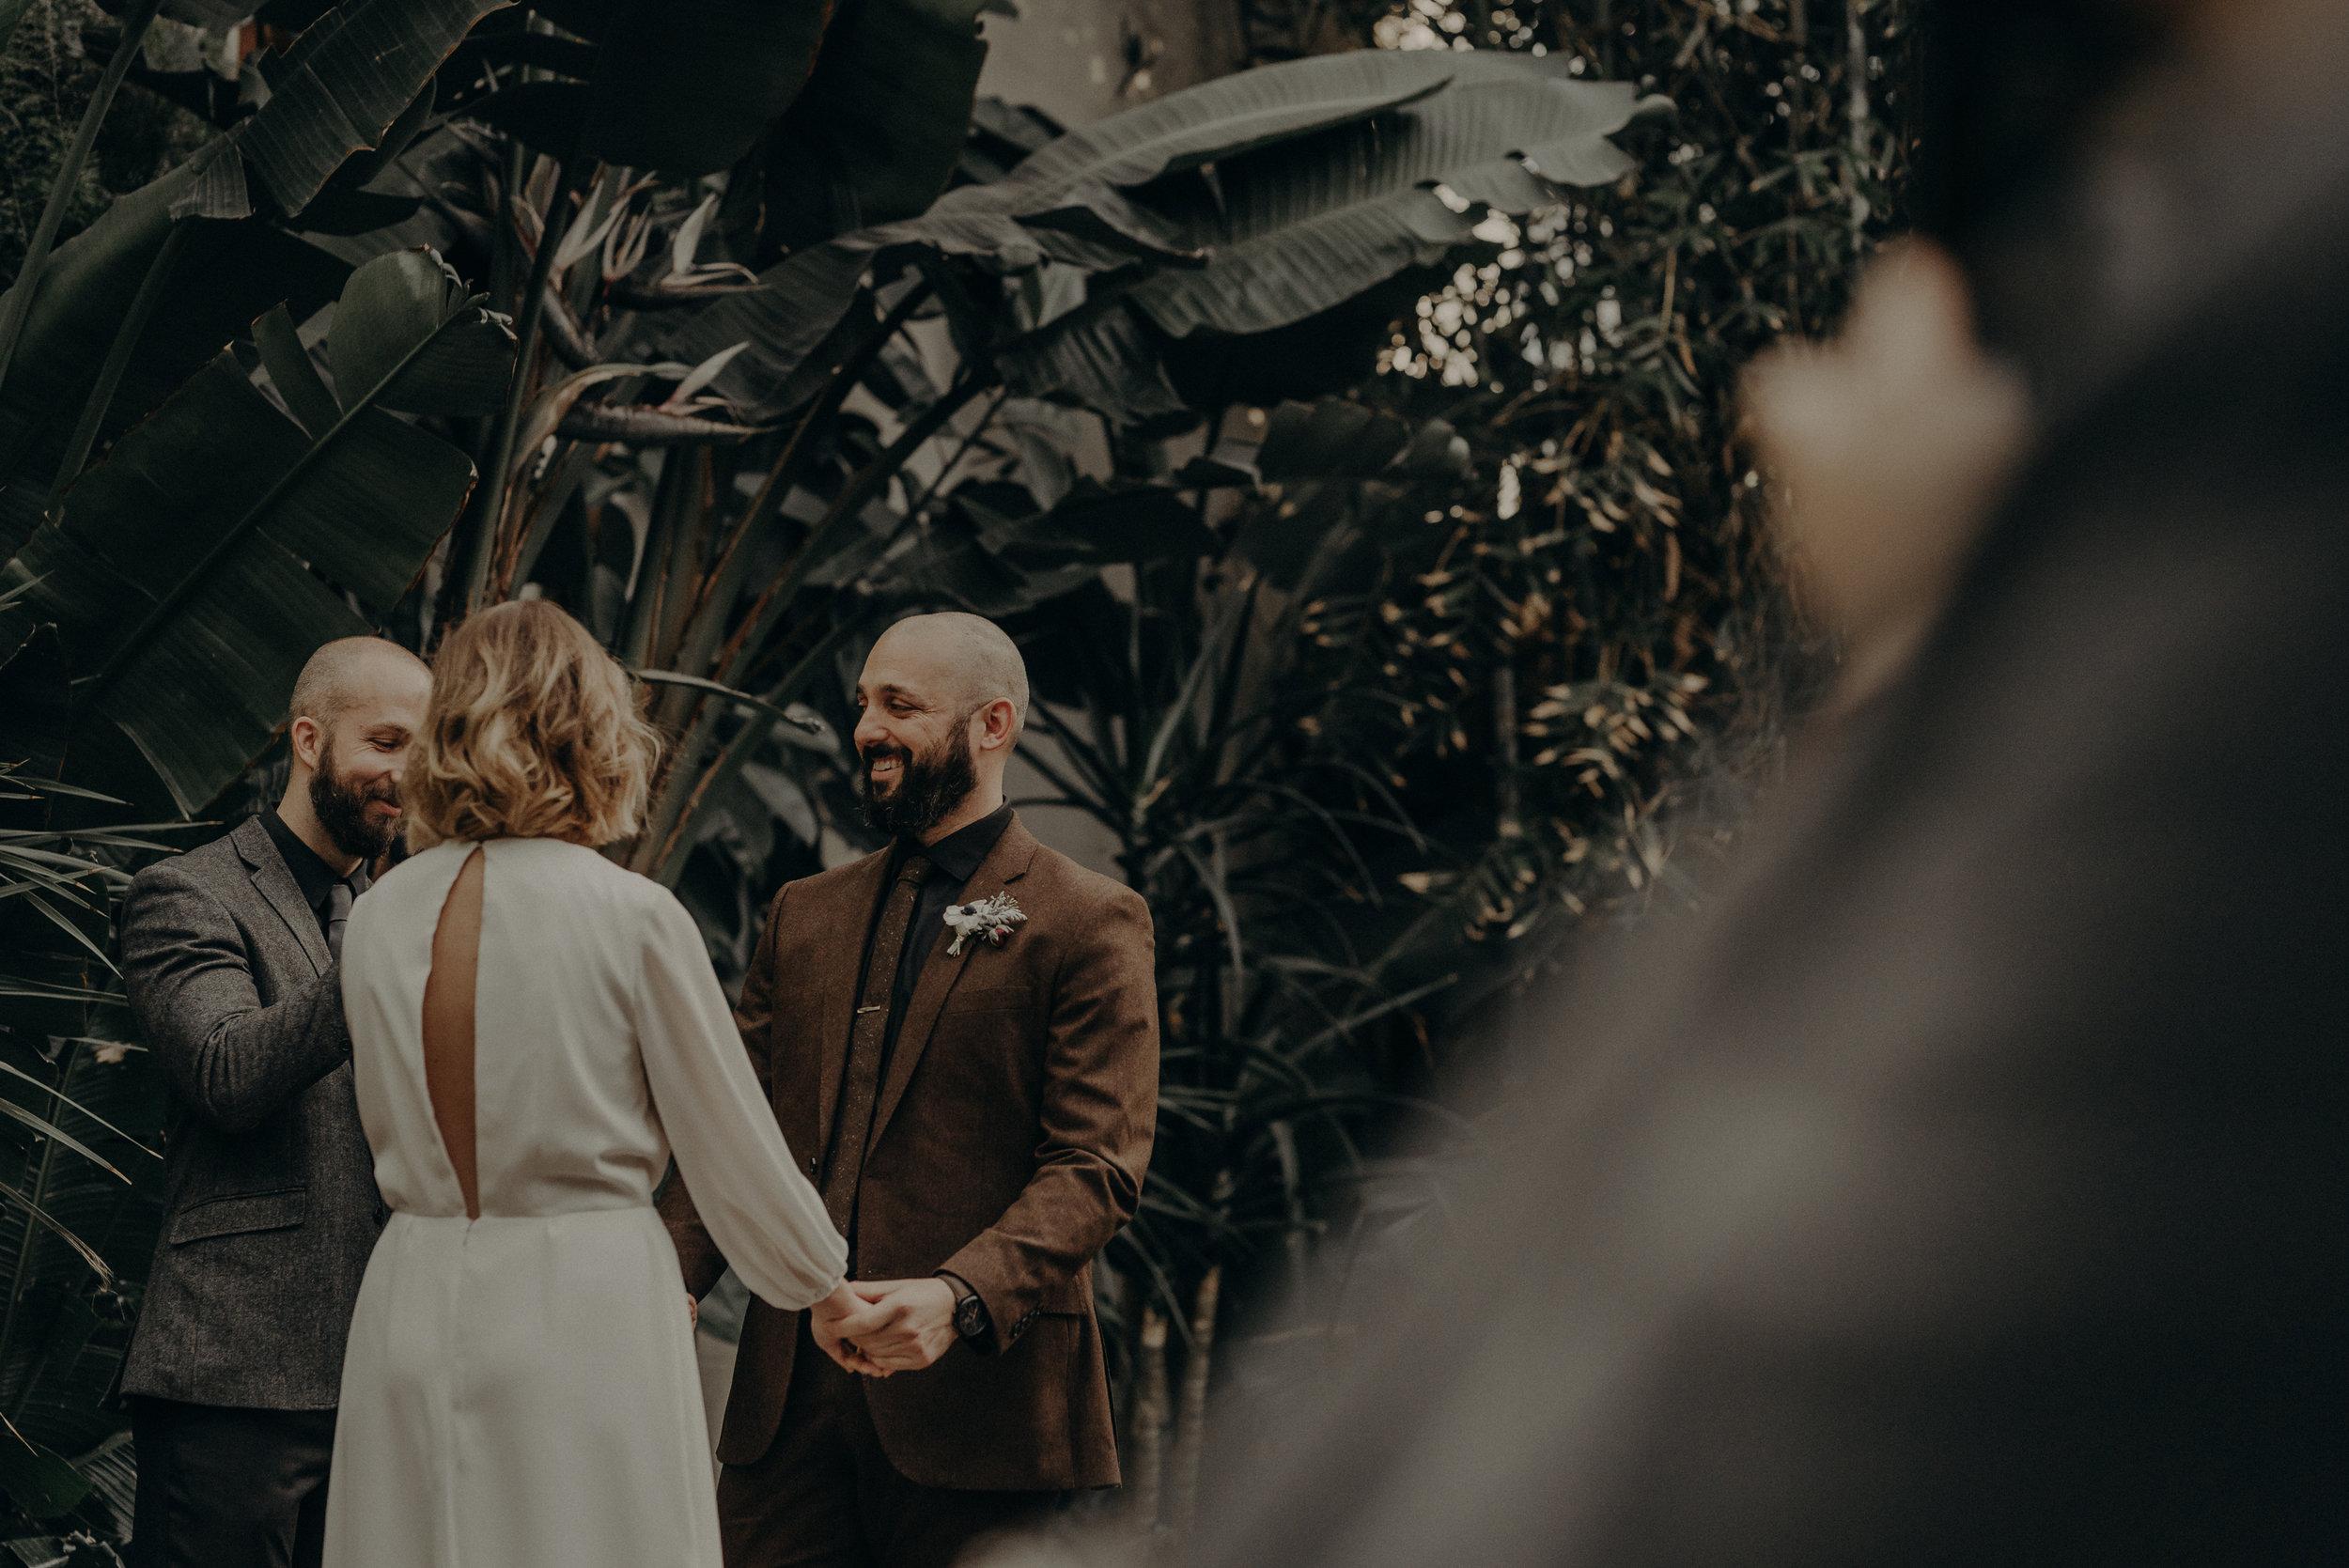 Isaiah + Taylor Photography - Reese + Jonathan Wedding-430.jpg